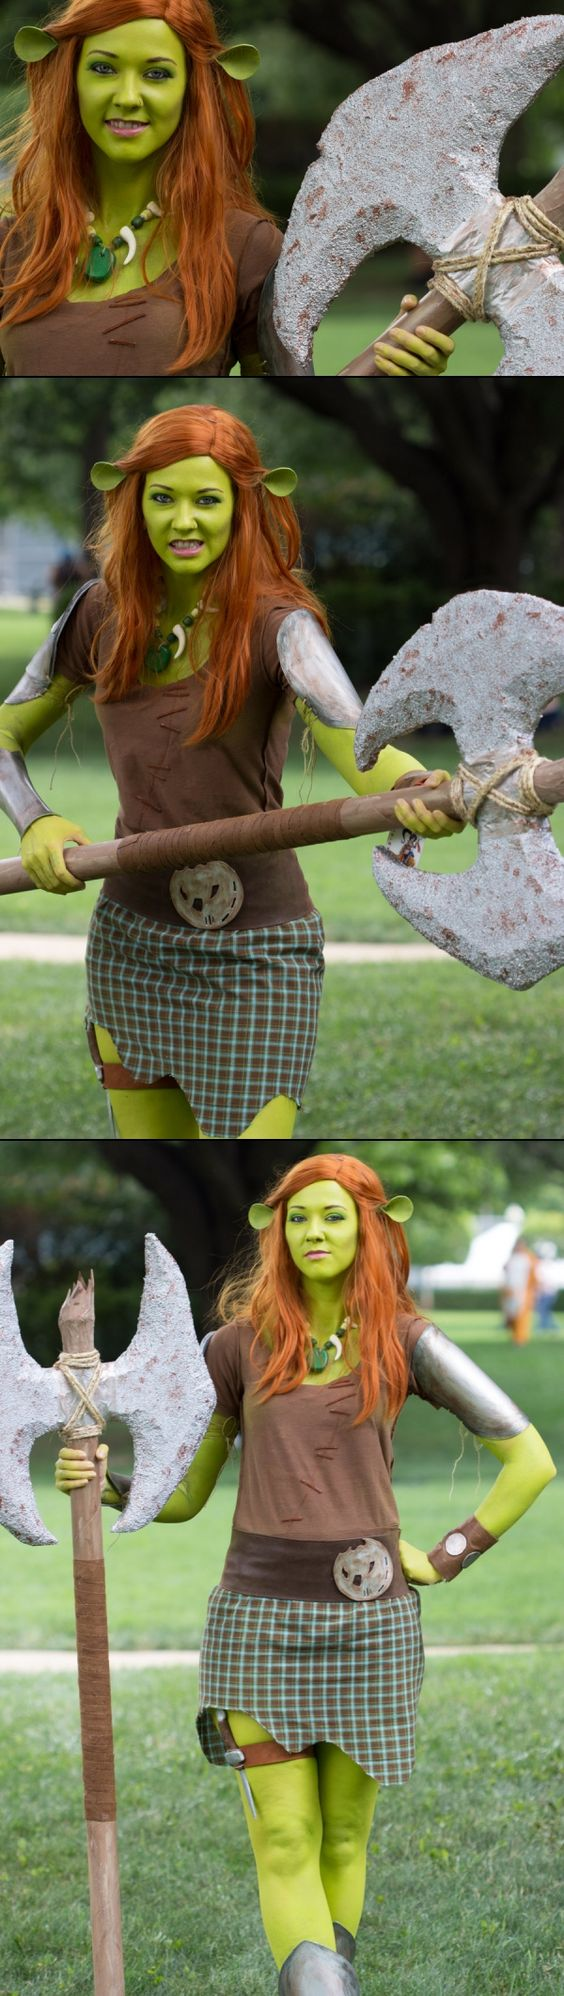 Shrek - Princess Fiona Cosplayer: GlitzyGeekGirl * Photographer: Seadaemon Photography